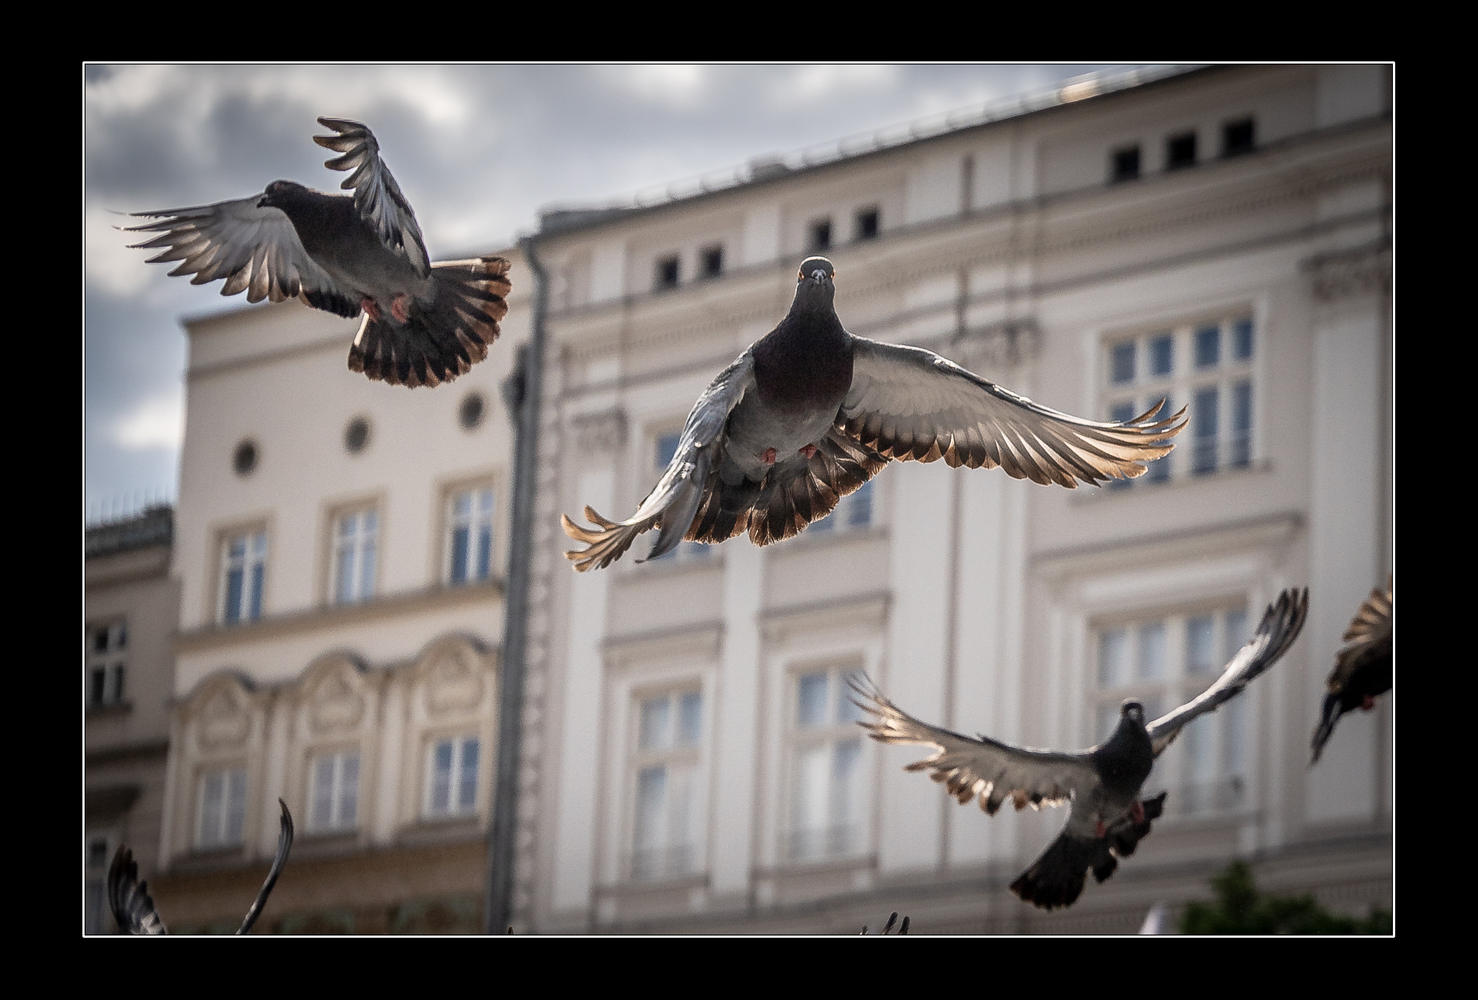 No fly zone by Piotr Pogonowski